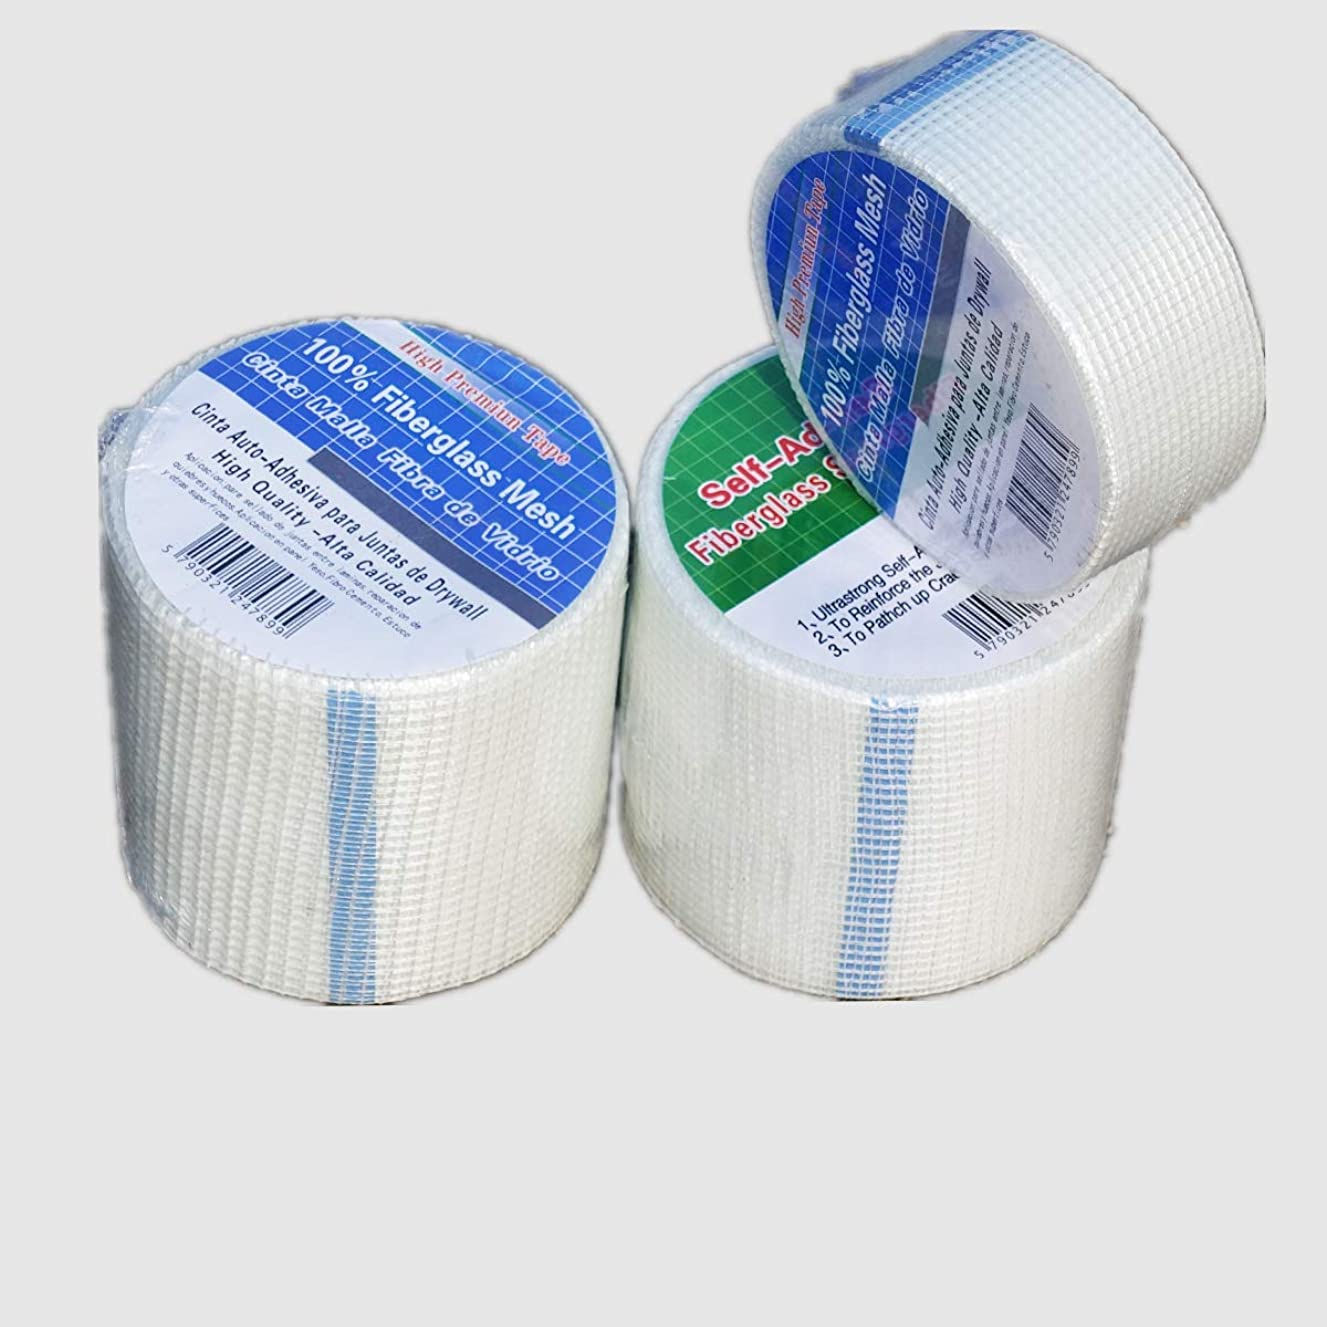 Yikai Self-Adhesive Fiberglass Mesh Backeboard Joint Alkali Resistent Mesh Construction Tape Roll - 1.8